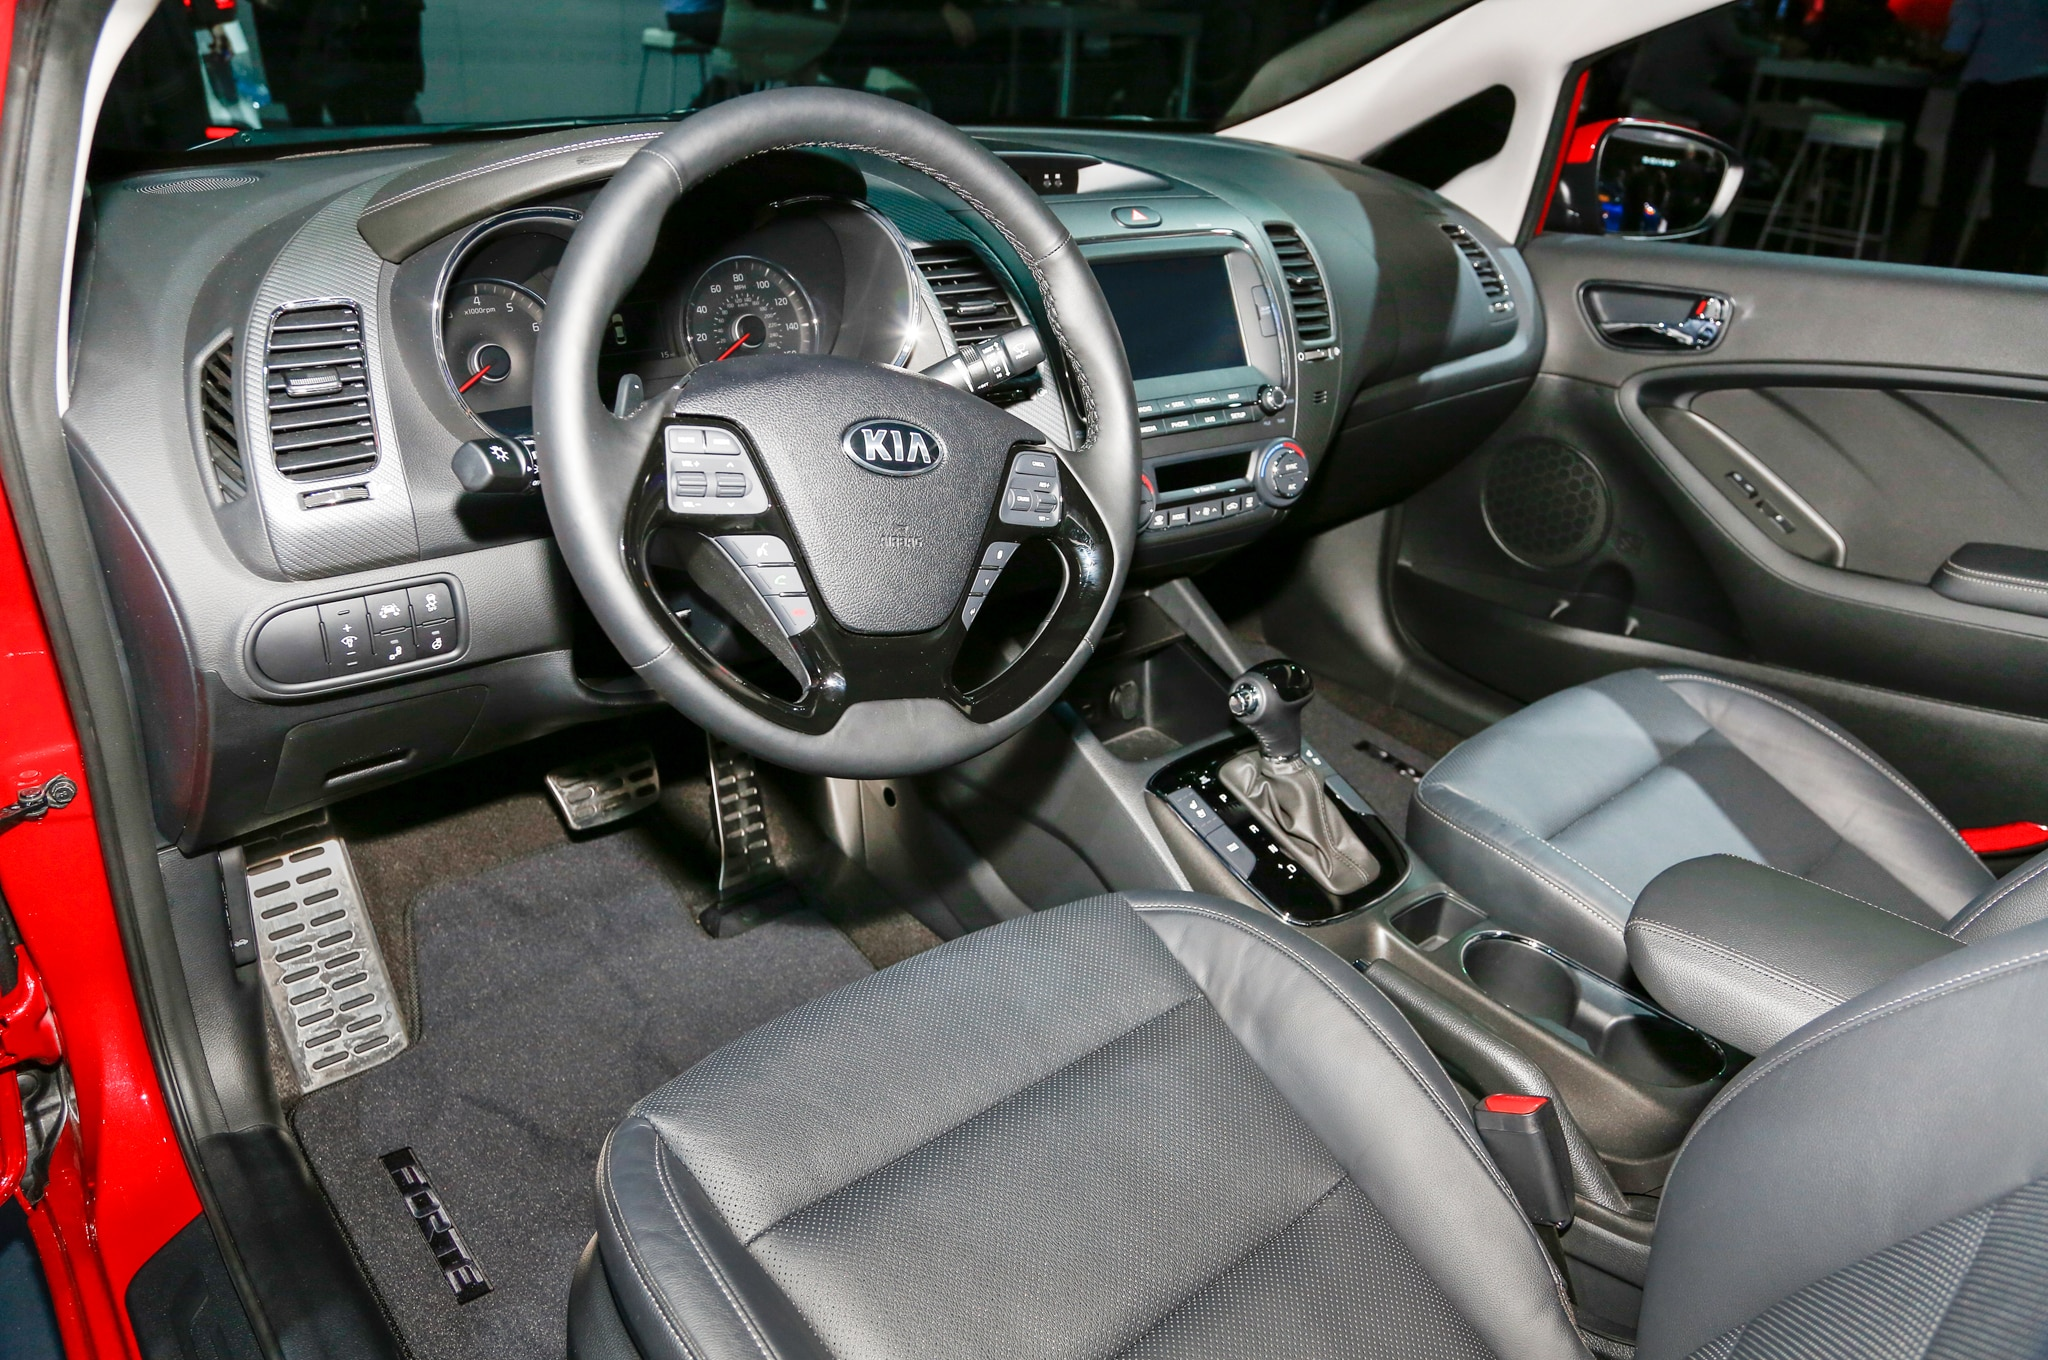 2017 Kia Forte Interior 29 Junio 2016 Wpengine